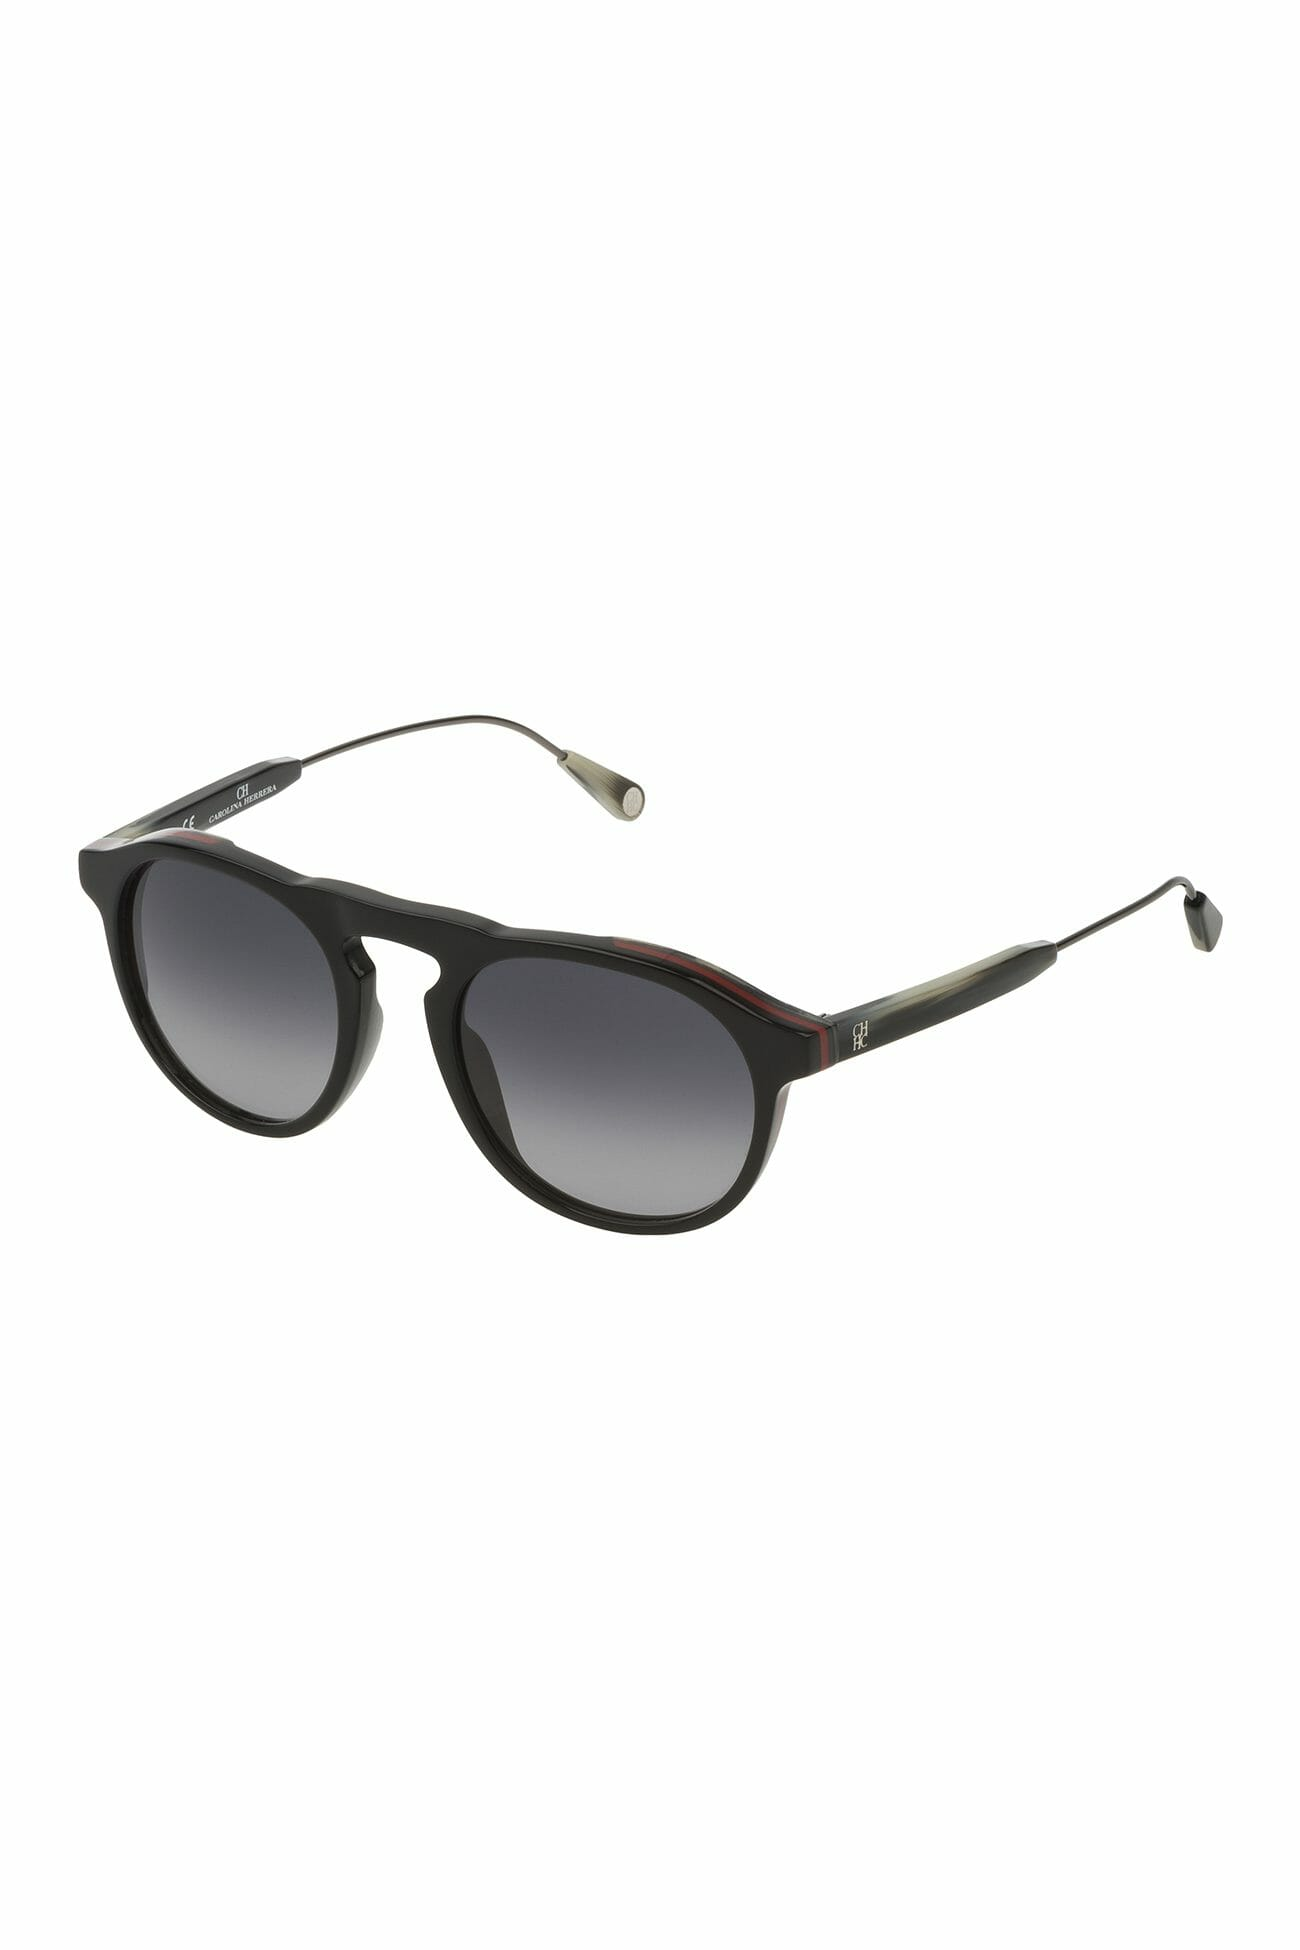 CH Carolina Herrera - gafas hombre